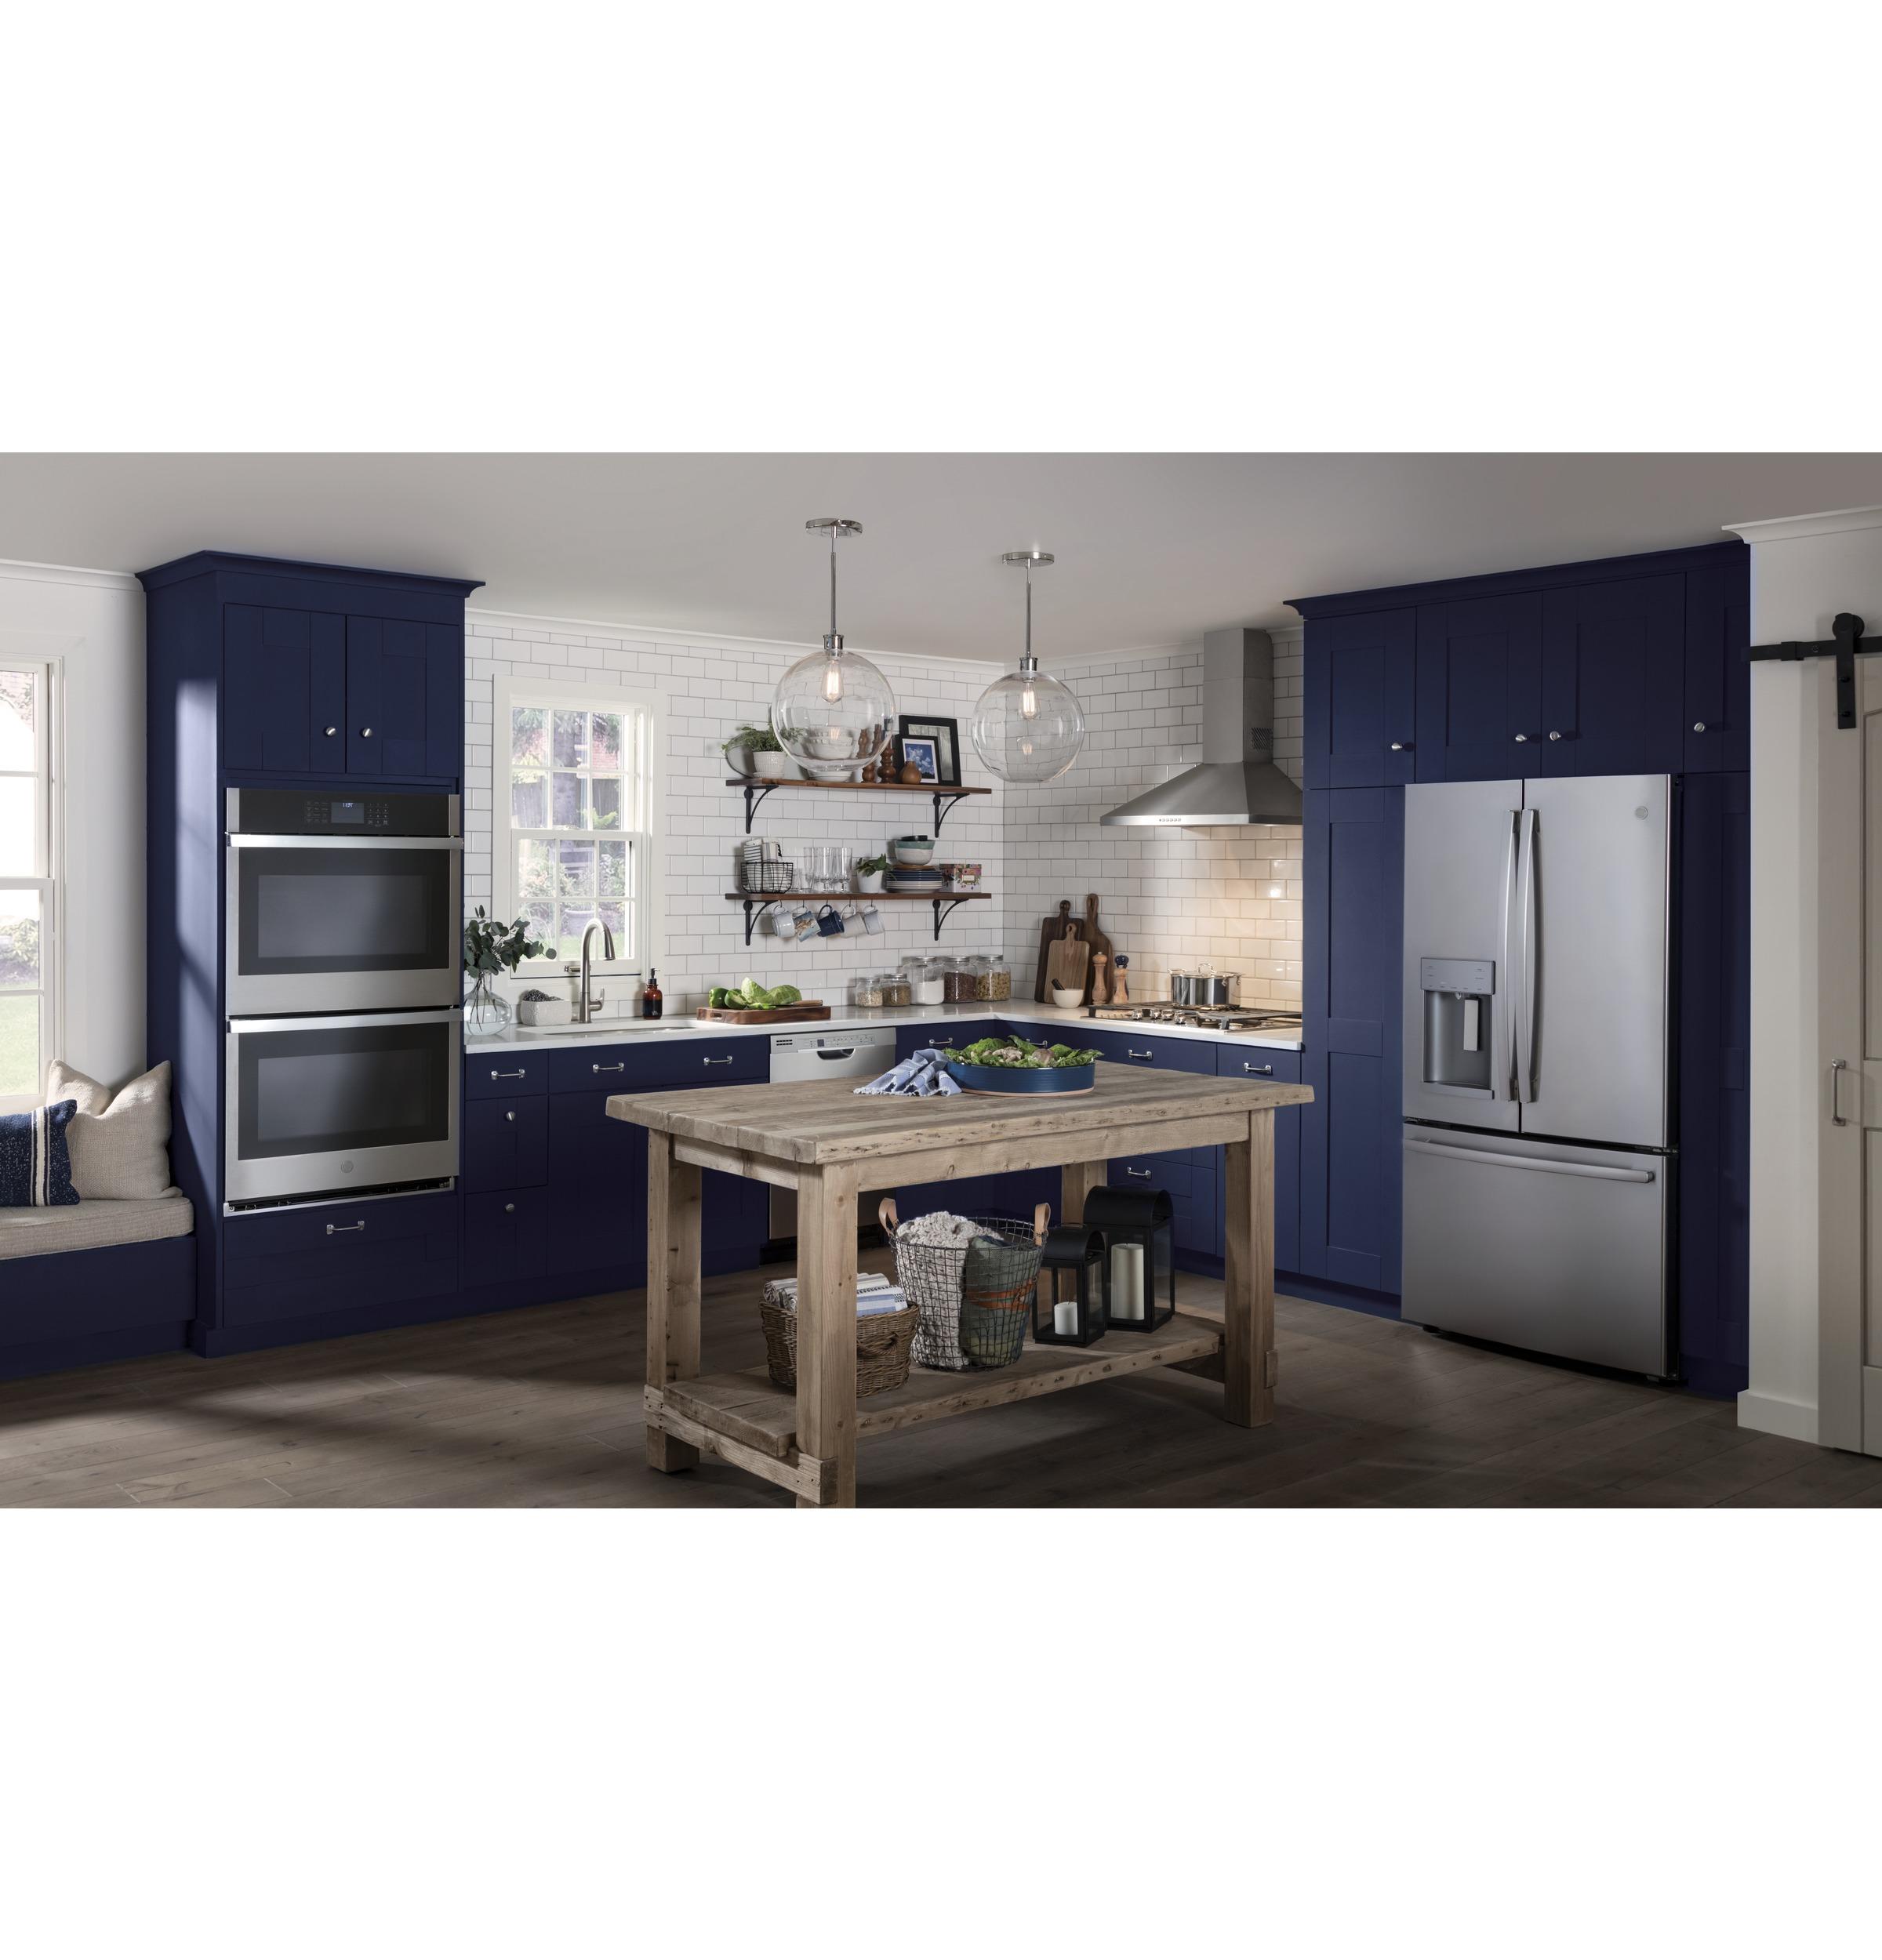 Model: GYE22HSKSS | GE GE® ENERGY STAR® 22.2 Cu. Ft. Counter-Depth French-Door Refrigerator